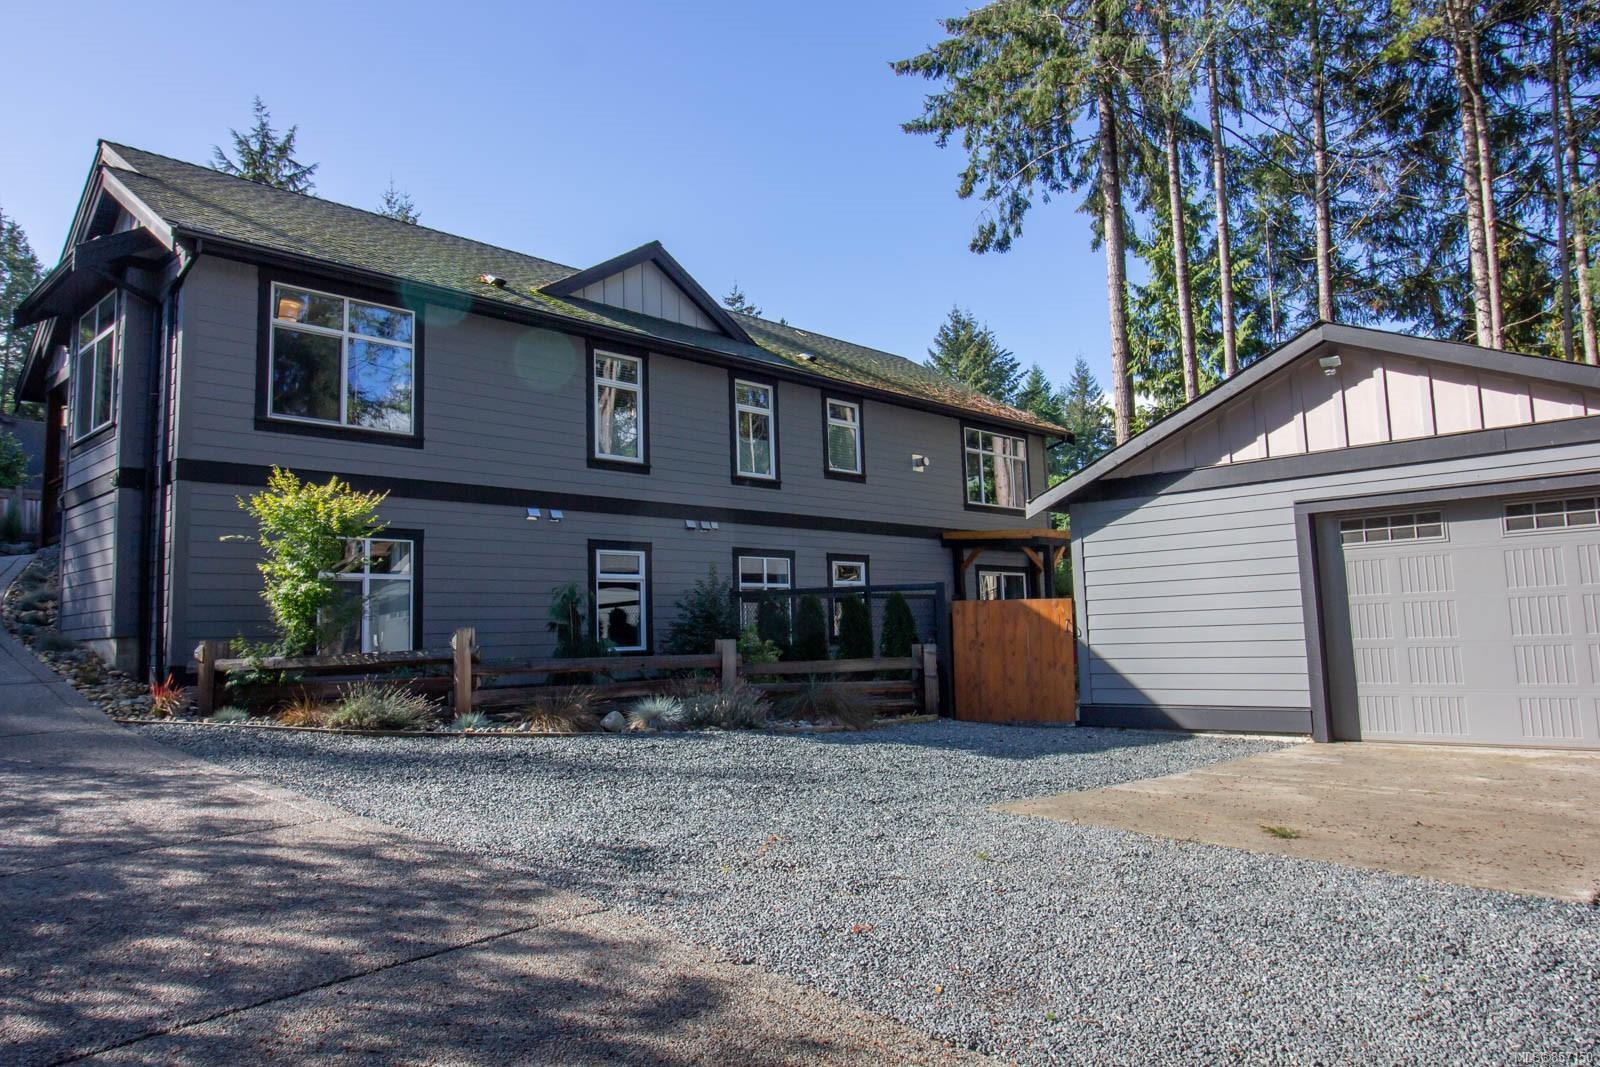 Main Photo: 2410 W Island Hwy in : PQ Qualicum Beach House for sale (Parksville/Qualicum)  : MLS®# 857150